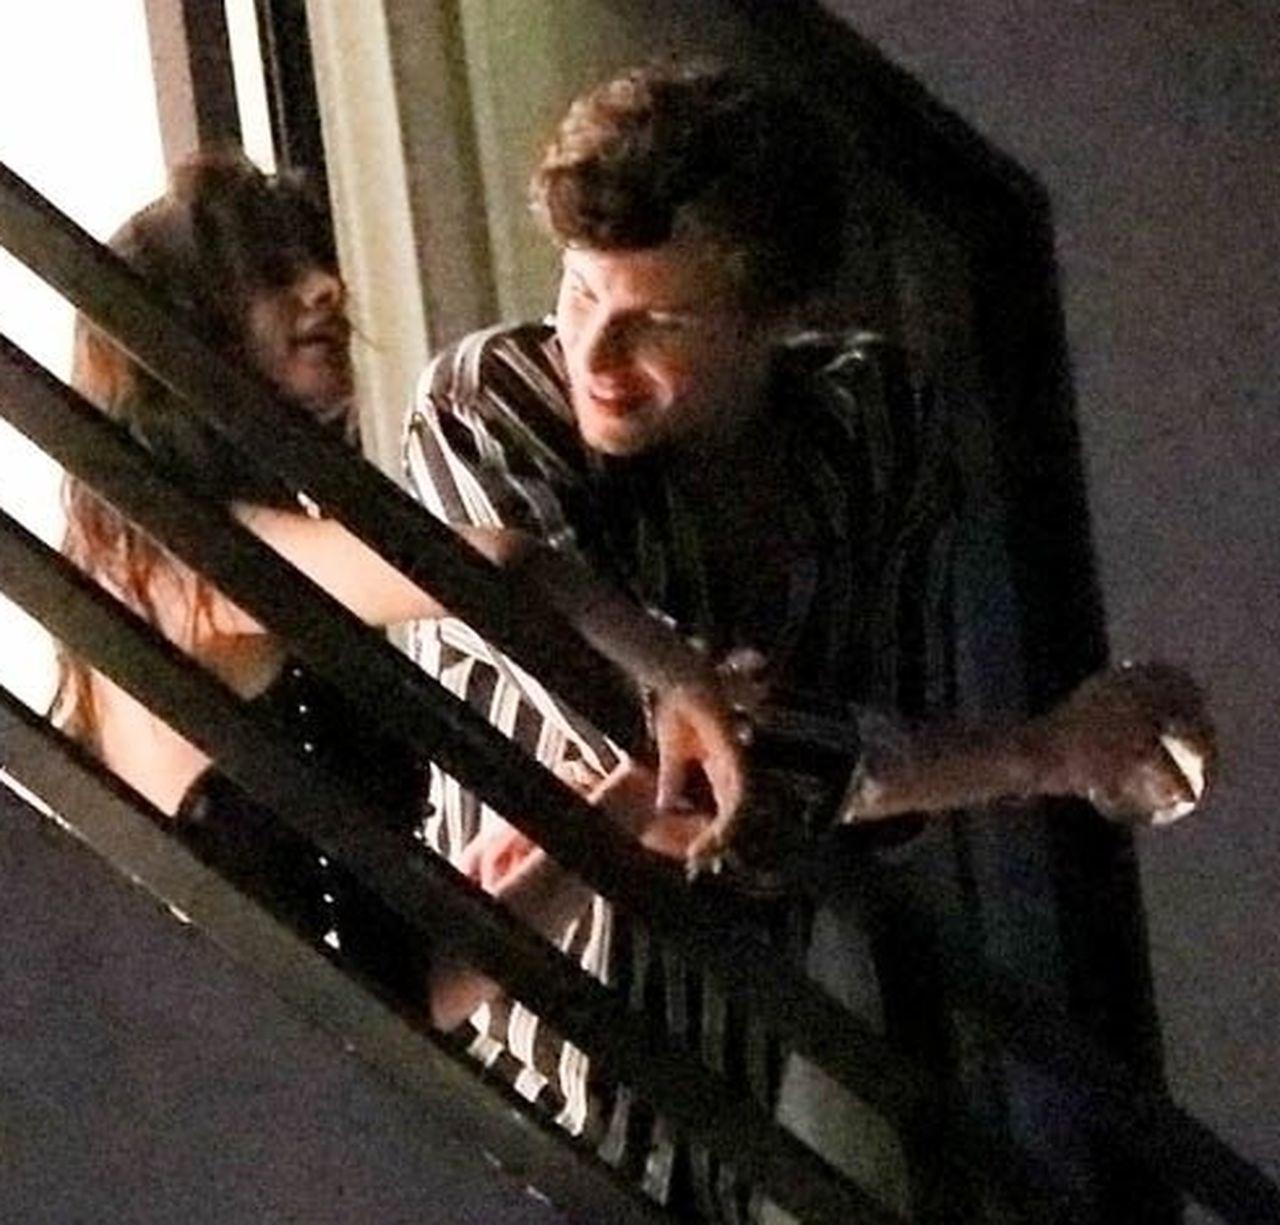 Camila Cabello i Shawn Mendes SĄ PARĄ! Mamy ich wspólne ZDJĘCIA